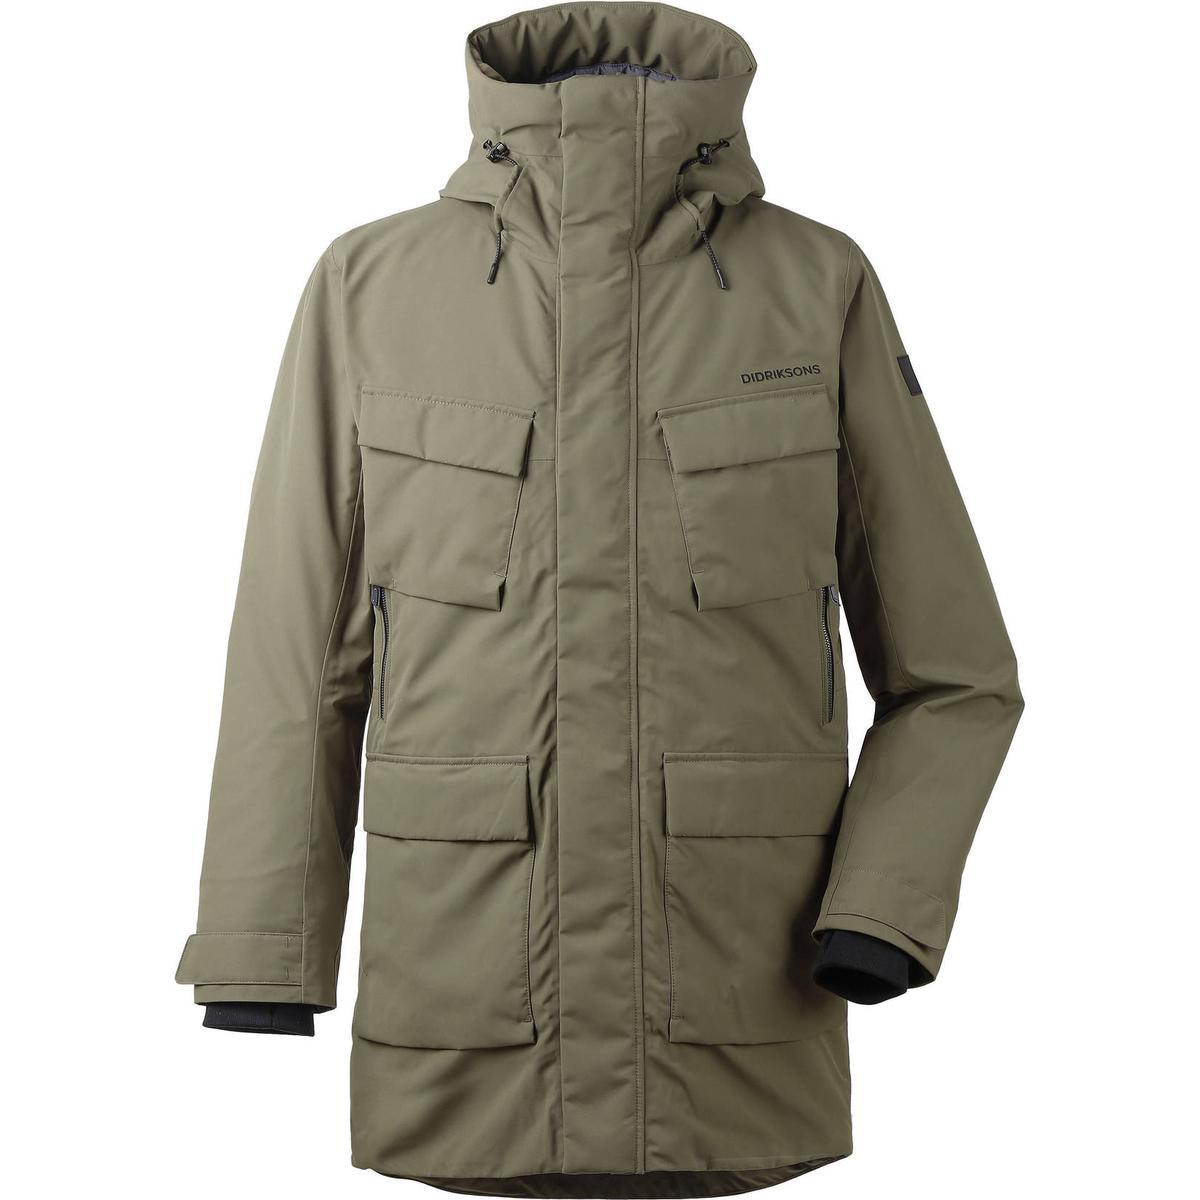 Didriksons Parka jakke Herretøj (400+ produkter) • Se priser